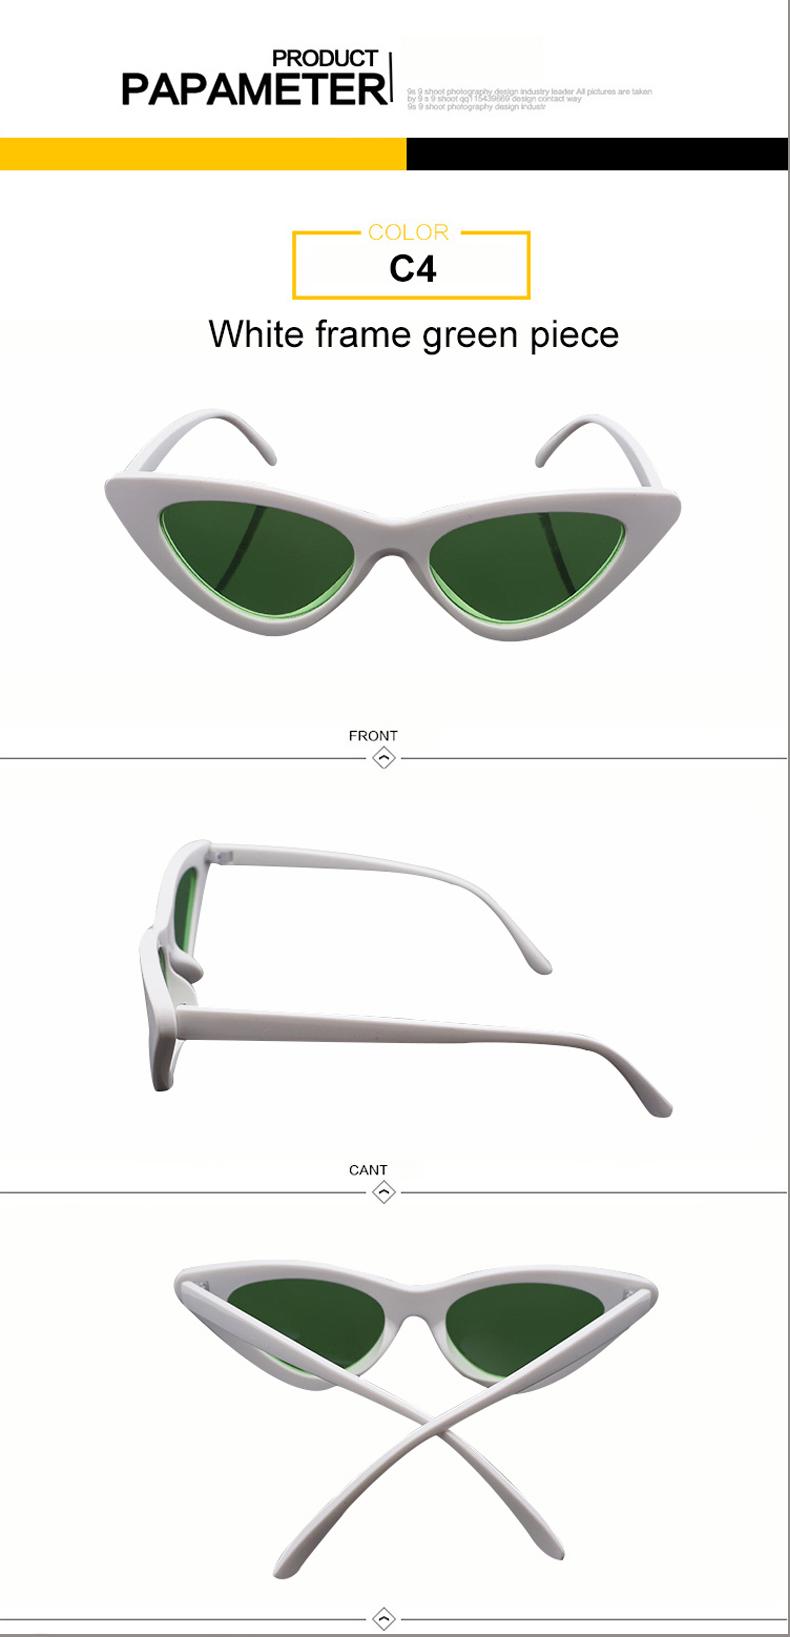 HTB12LMlnwoQMeJjy1Xaq6ASsFXap - WHO CUTIE 2018 Brand Designer Black Cat Eye Sunglasses Women Cool Small Cateye Frame Sun Glasses Fashion UV400 Shades WG-008